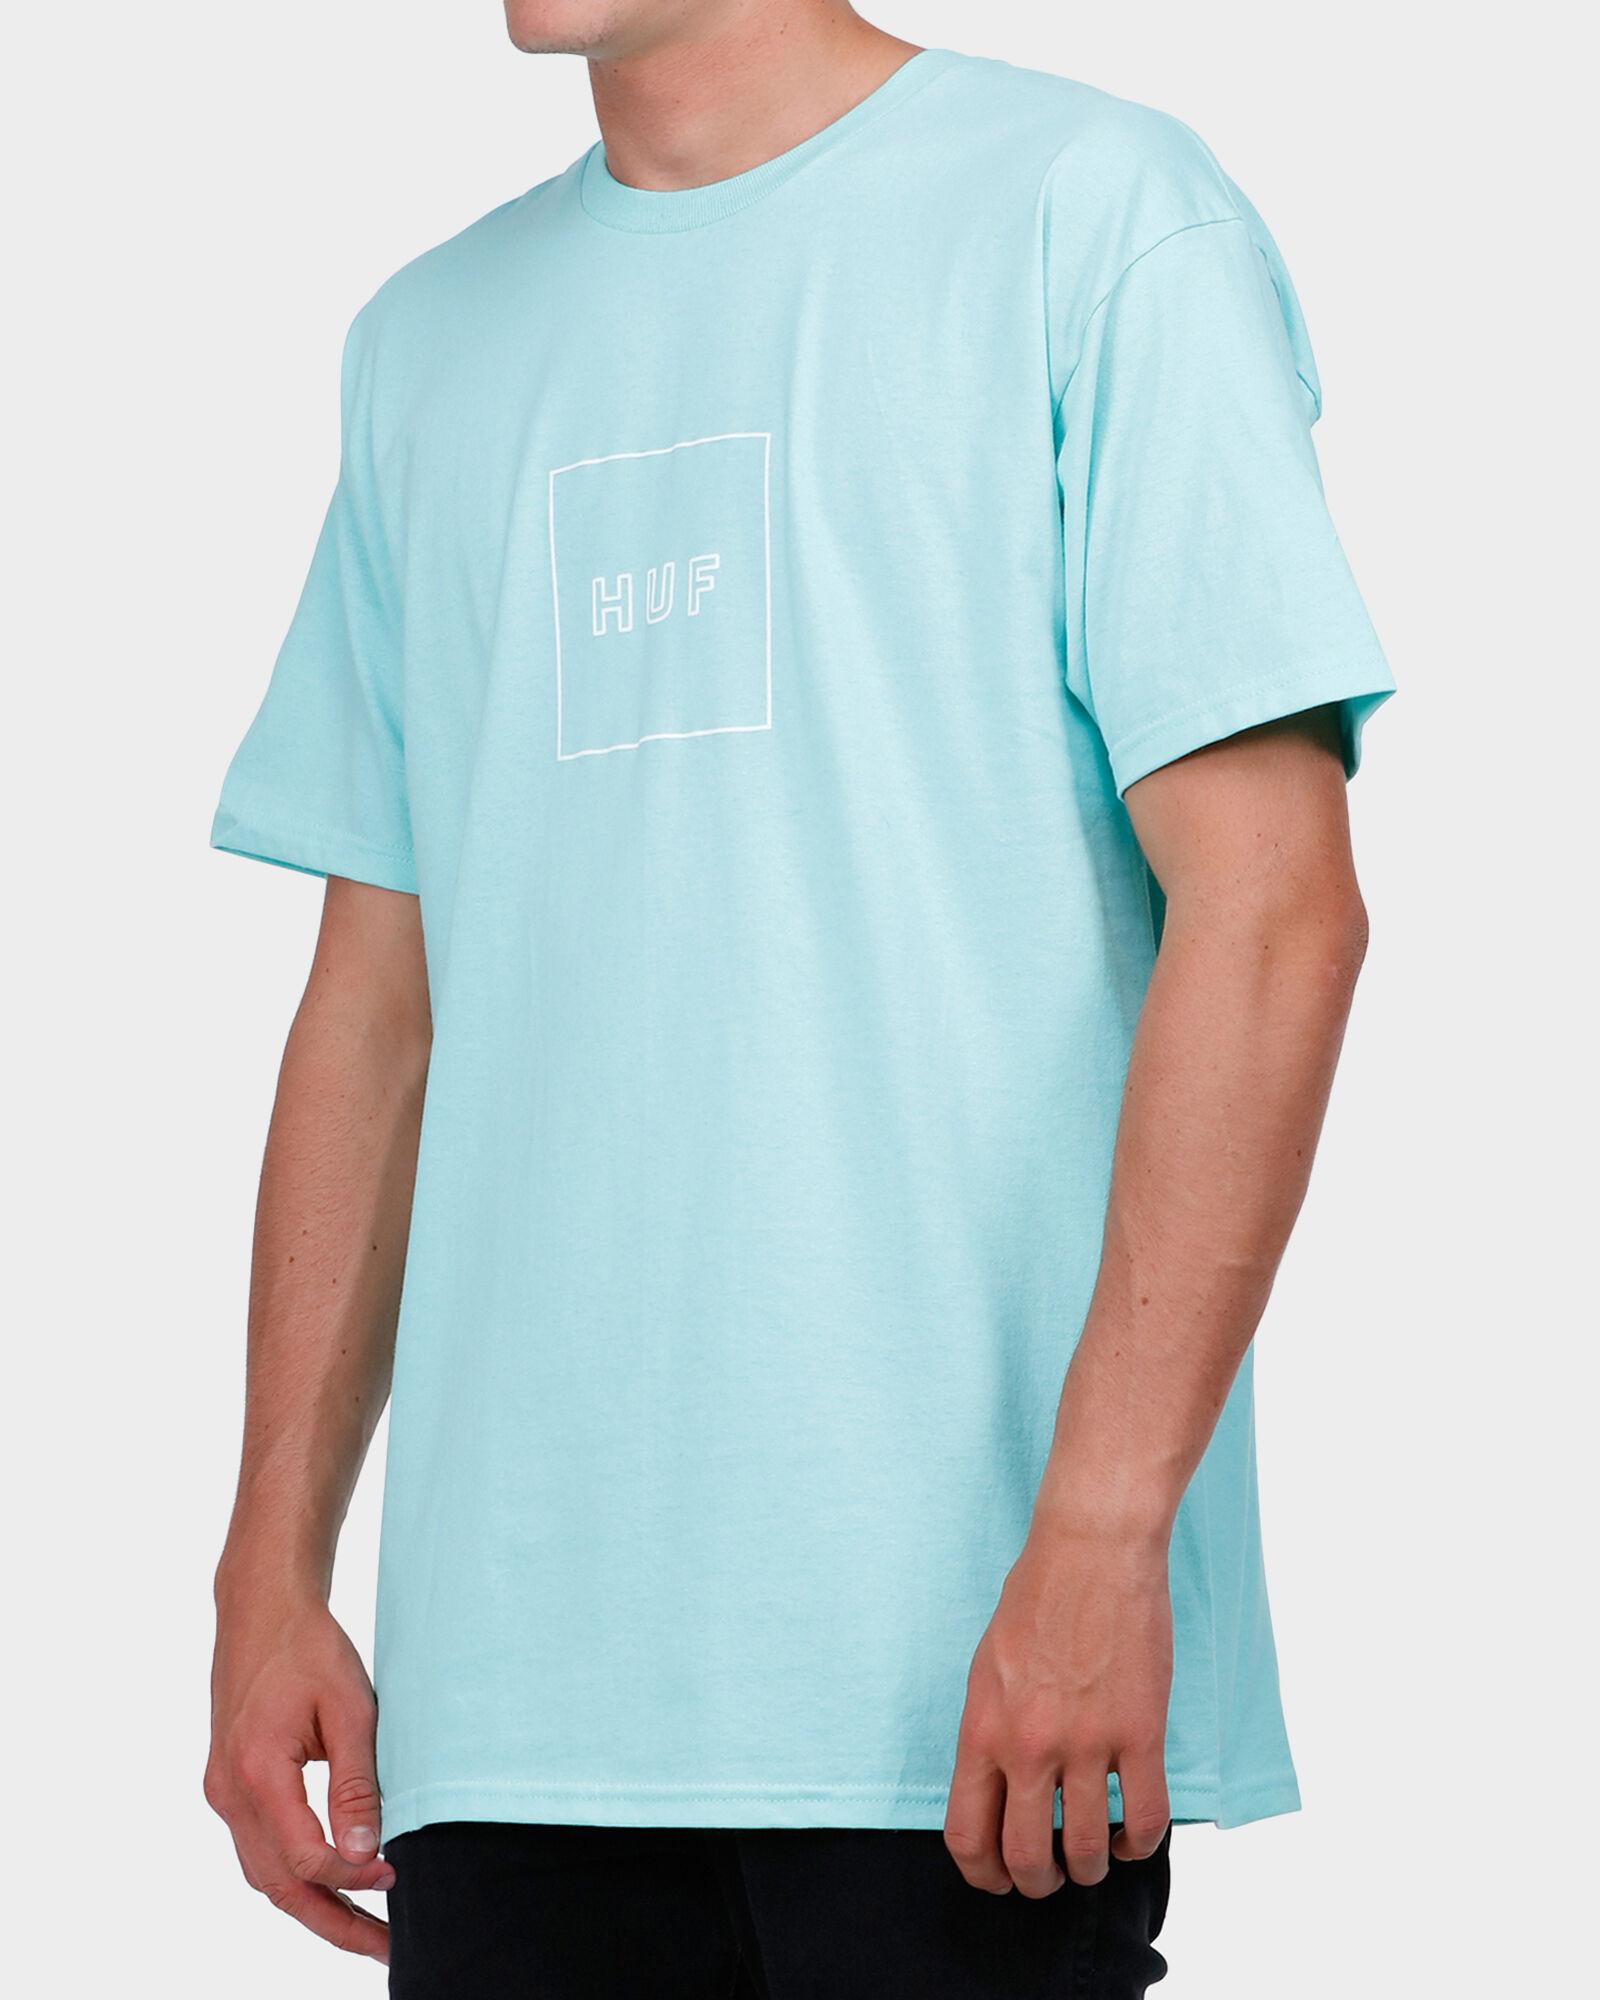 Celadon BOX LOGO PUFF TEE | Surf, Dive 'N' Ski